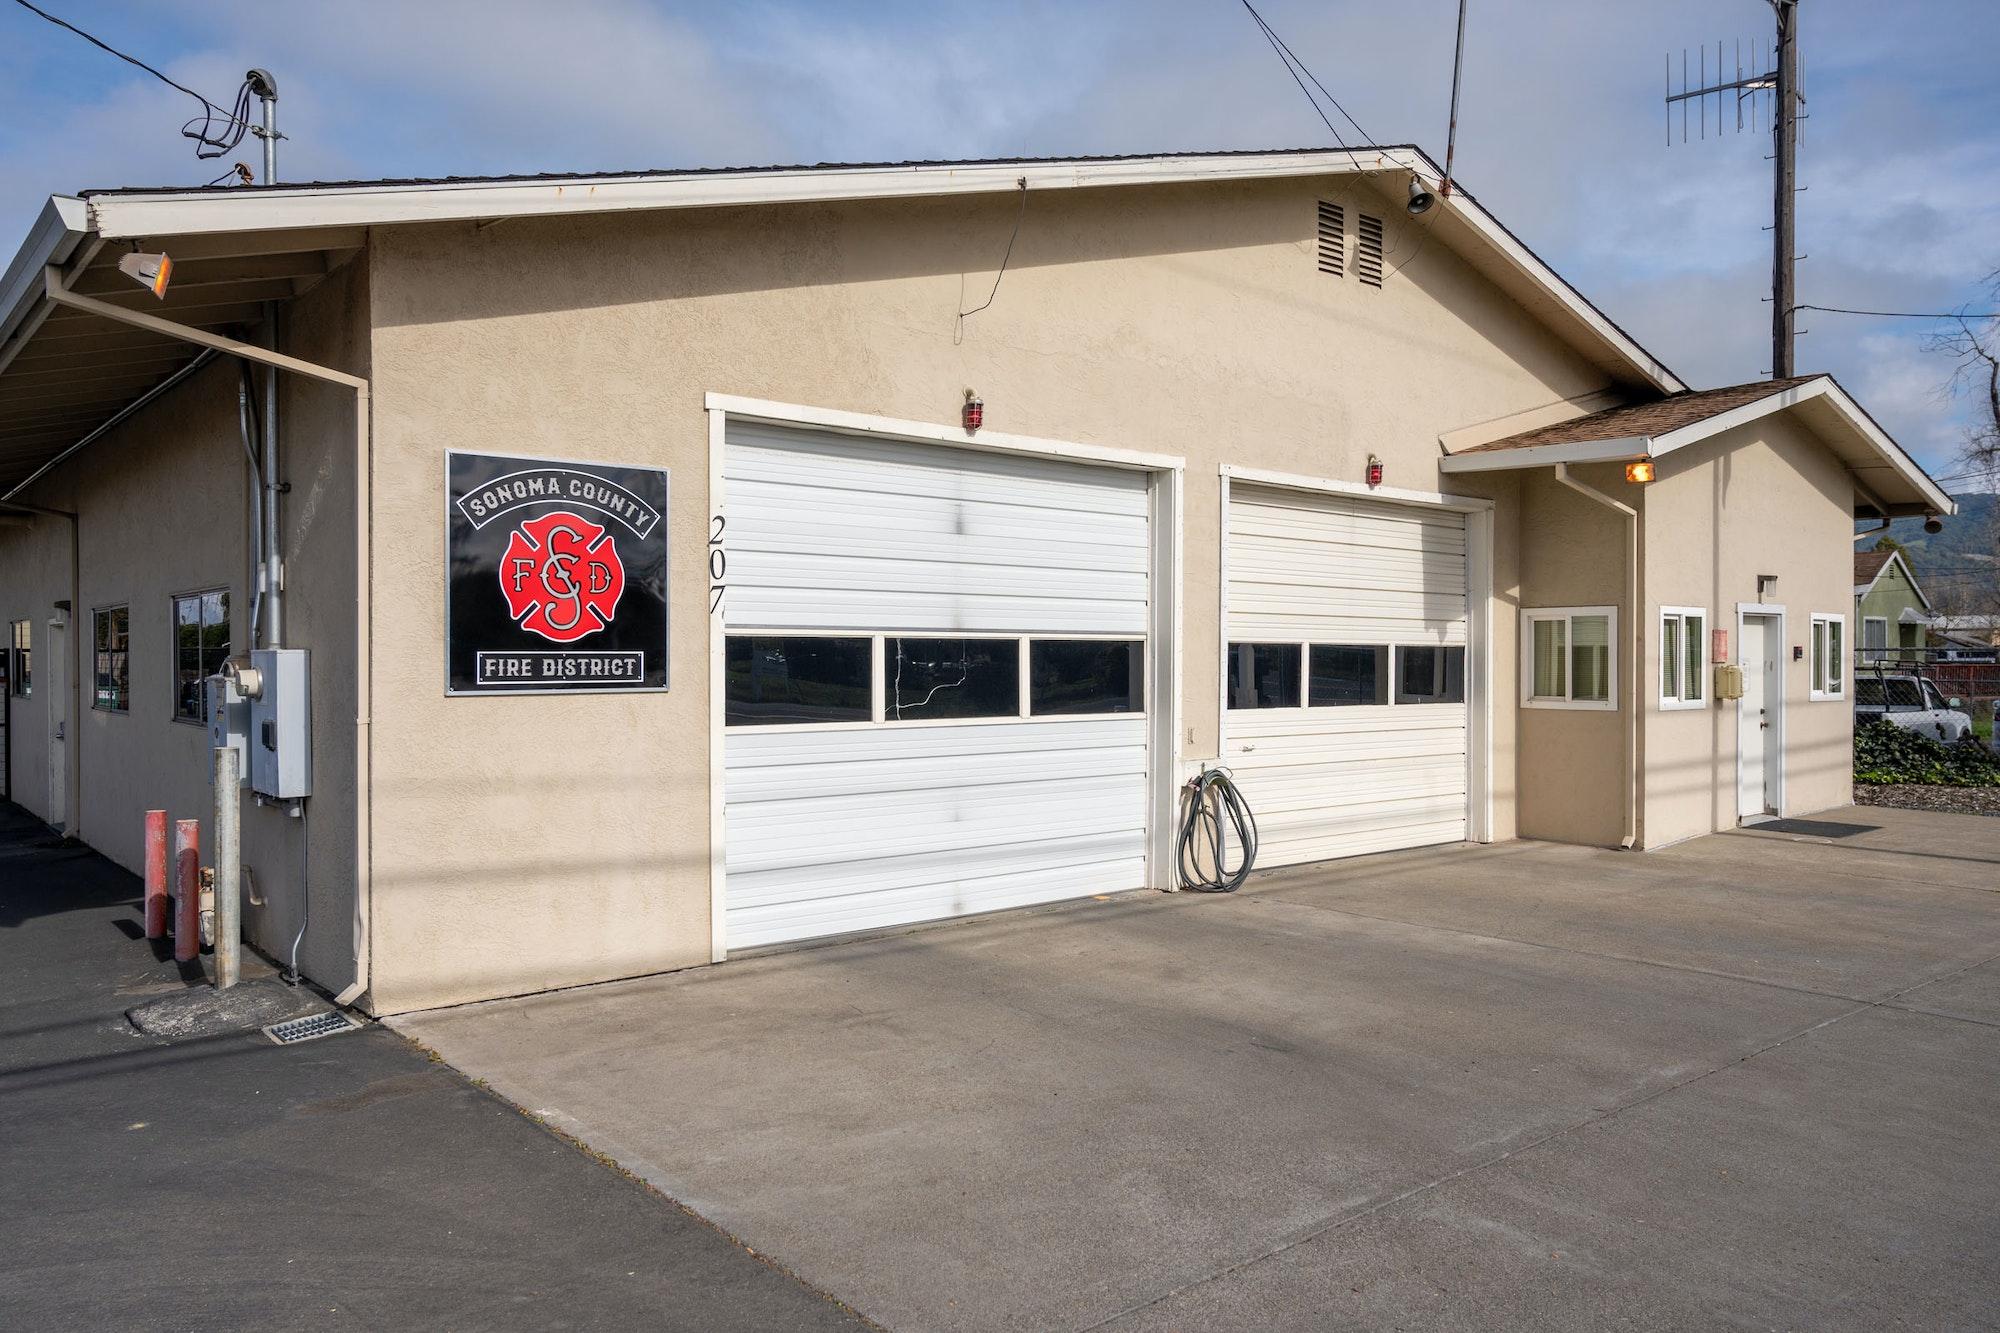 May contain: garage